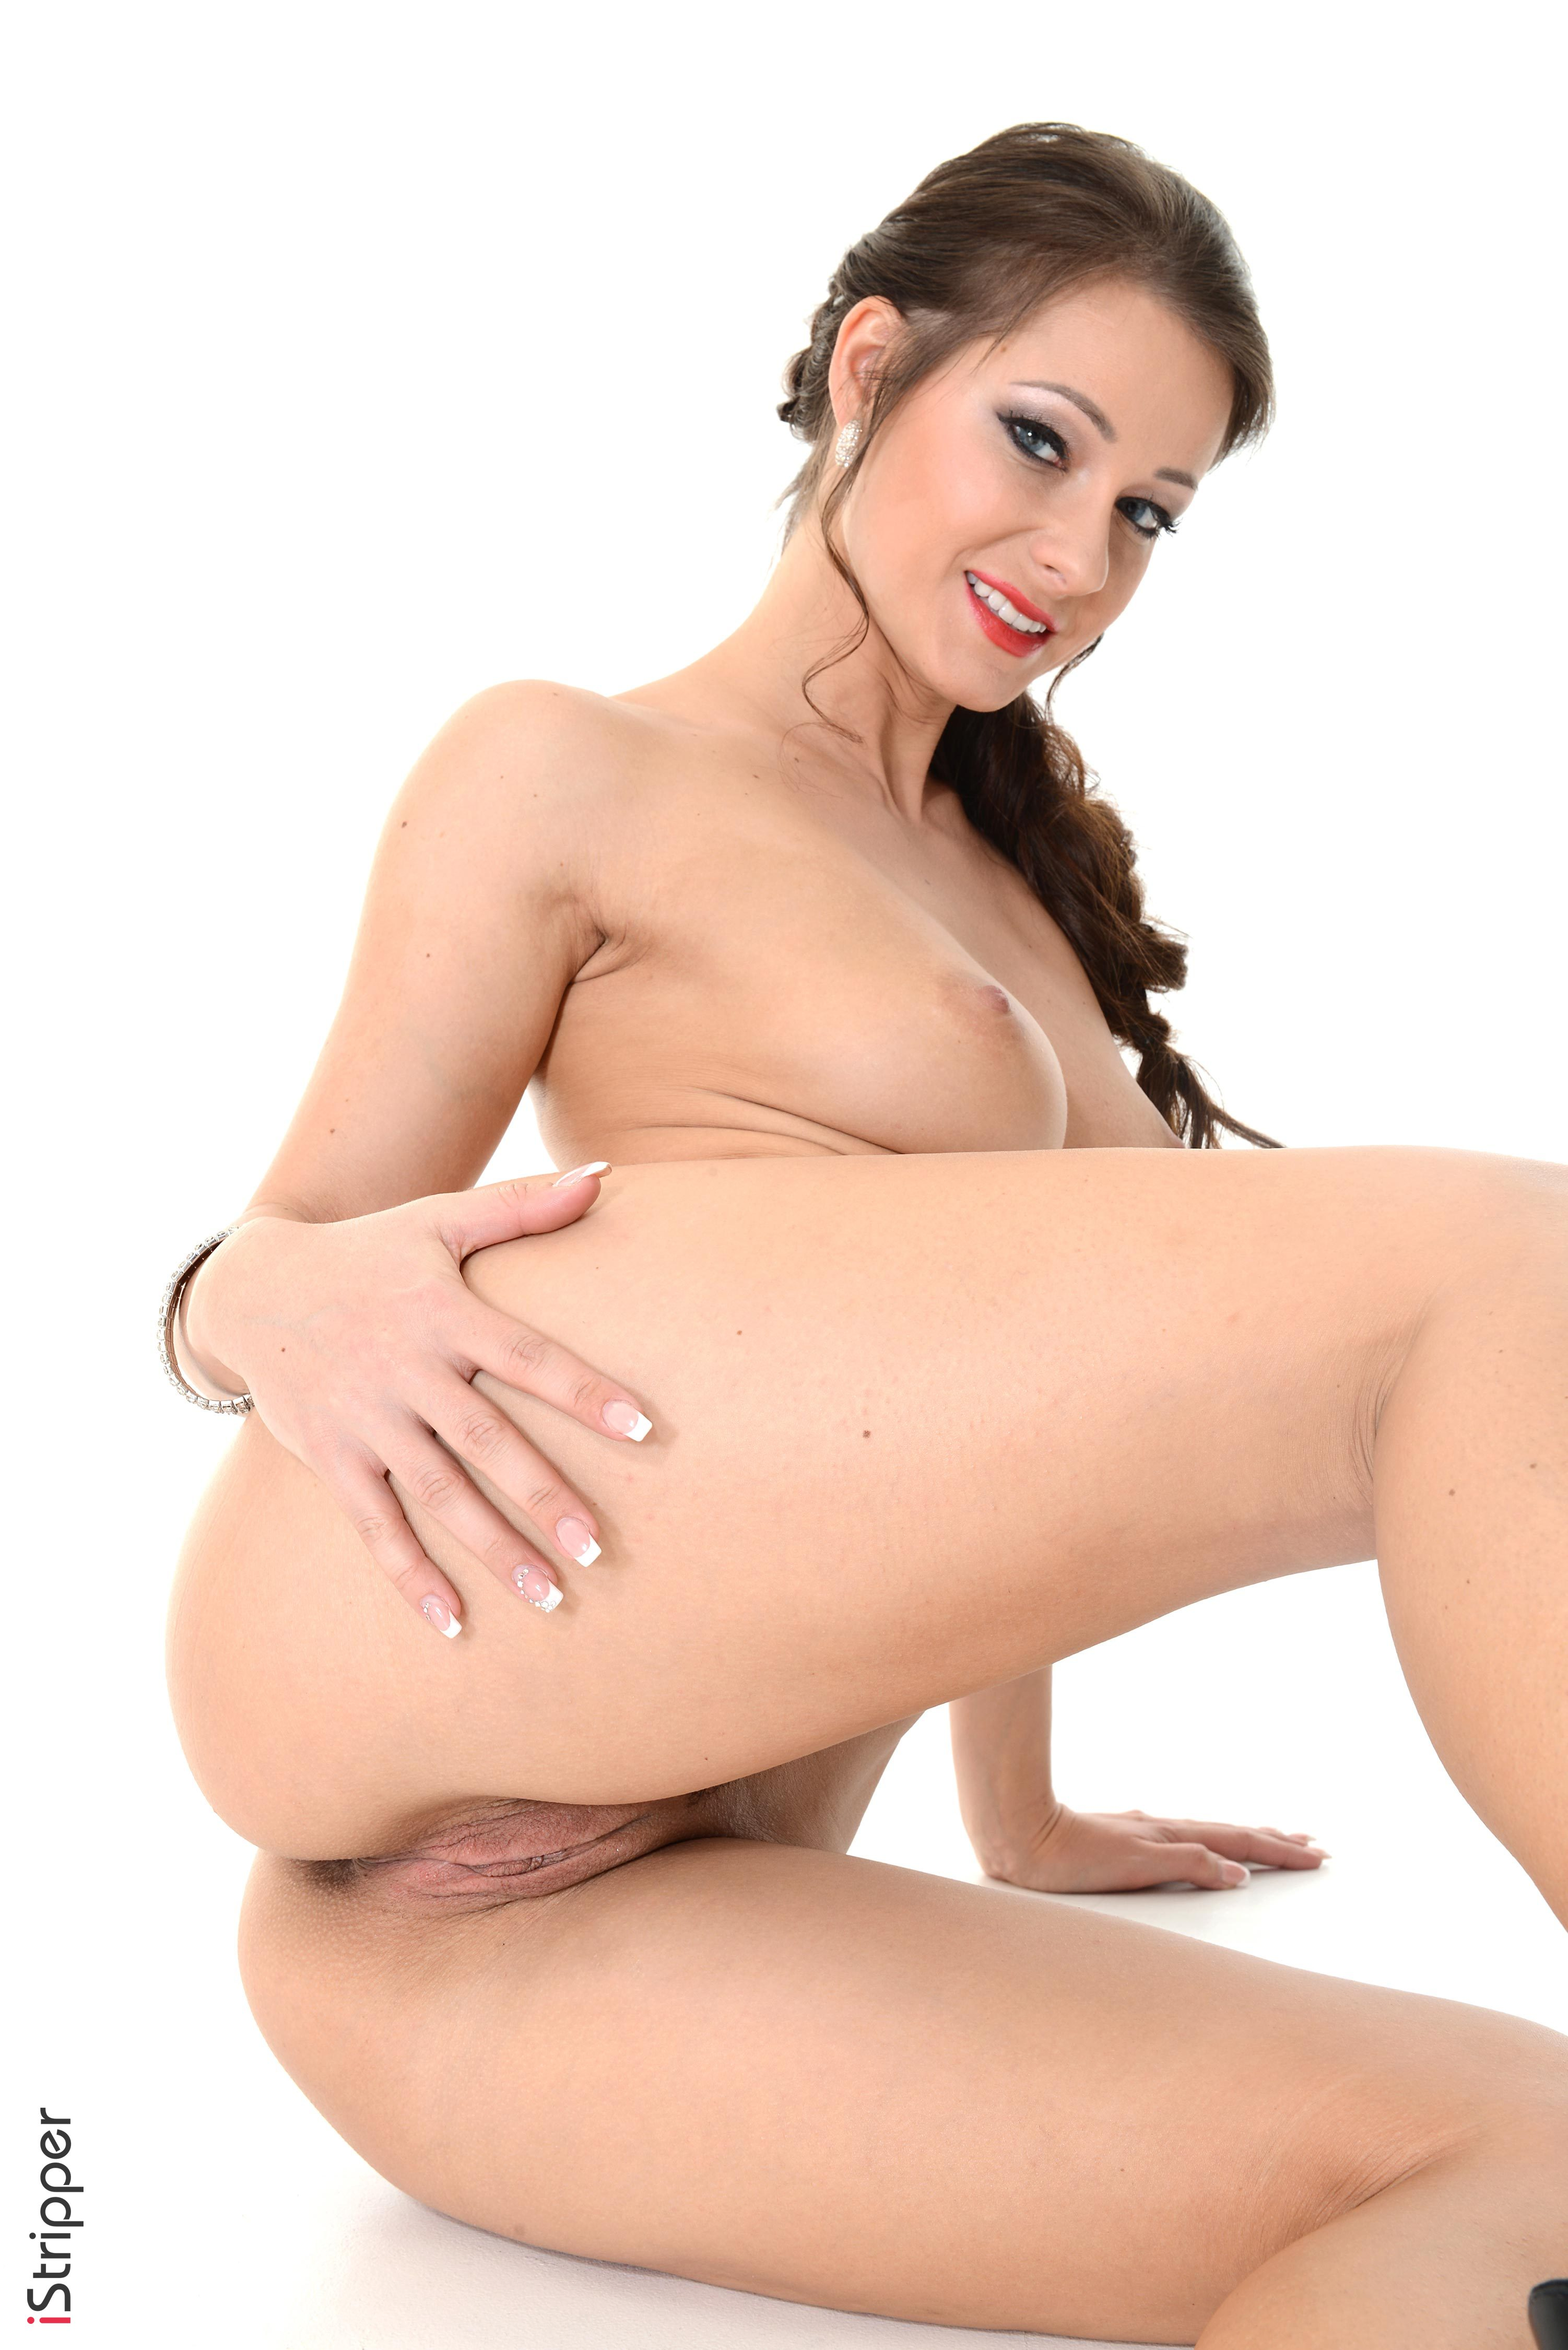 perfect boobs wallpaper